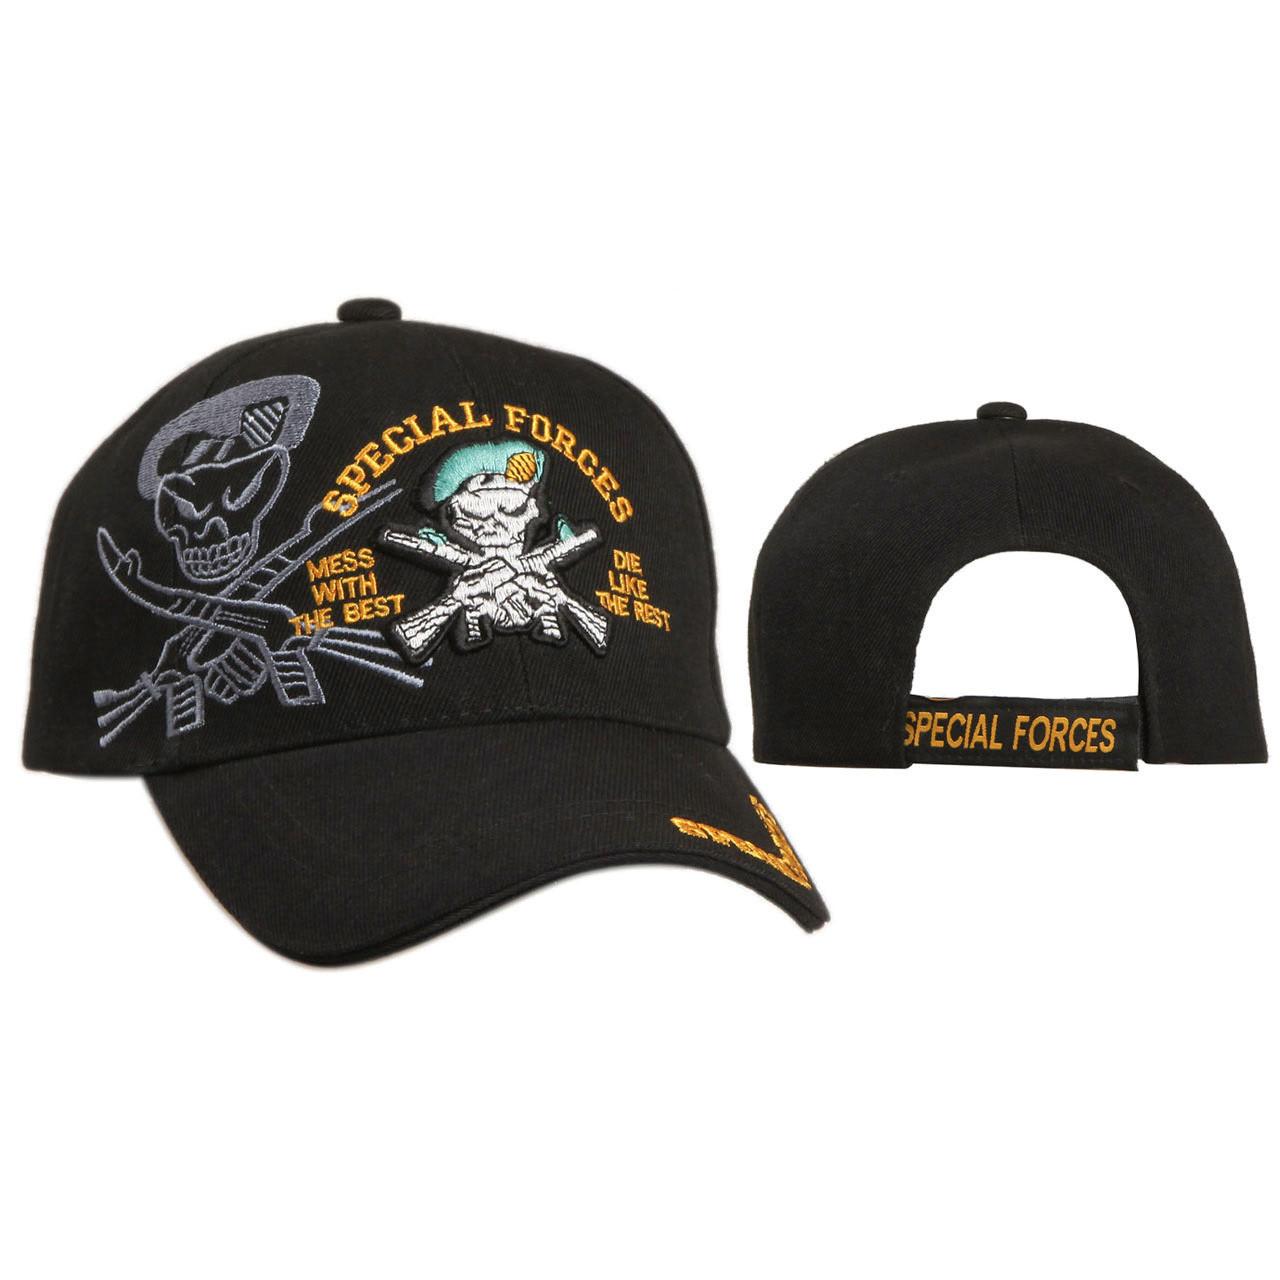 Military Baseball Caps Wholesale C154